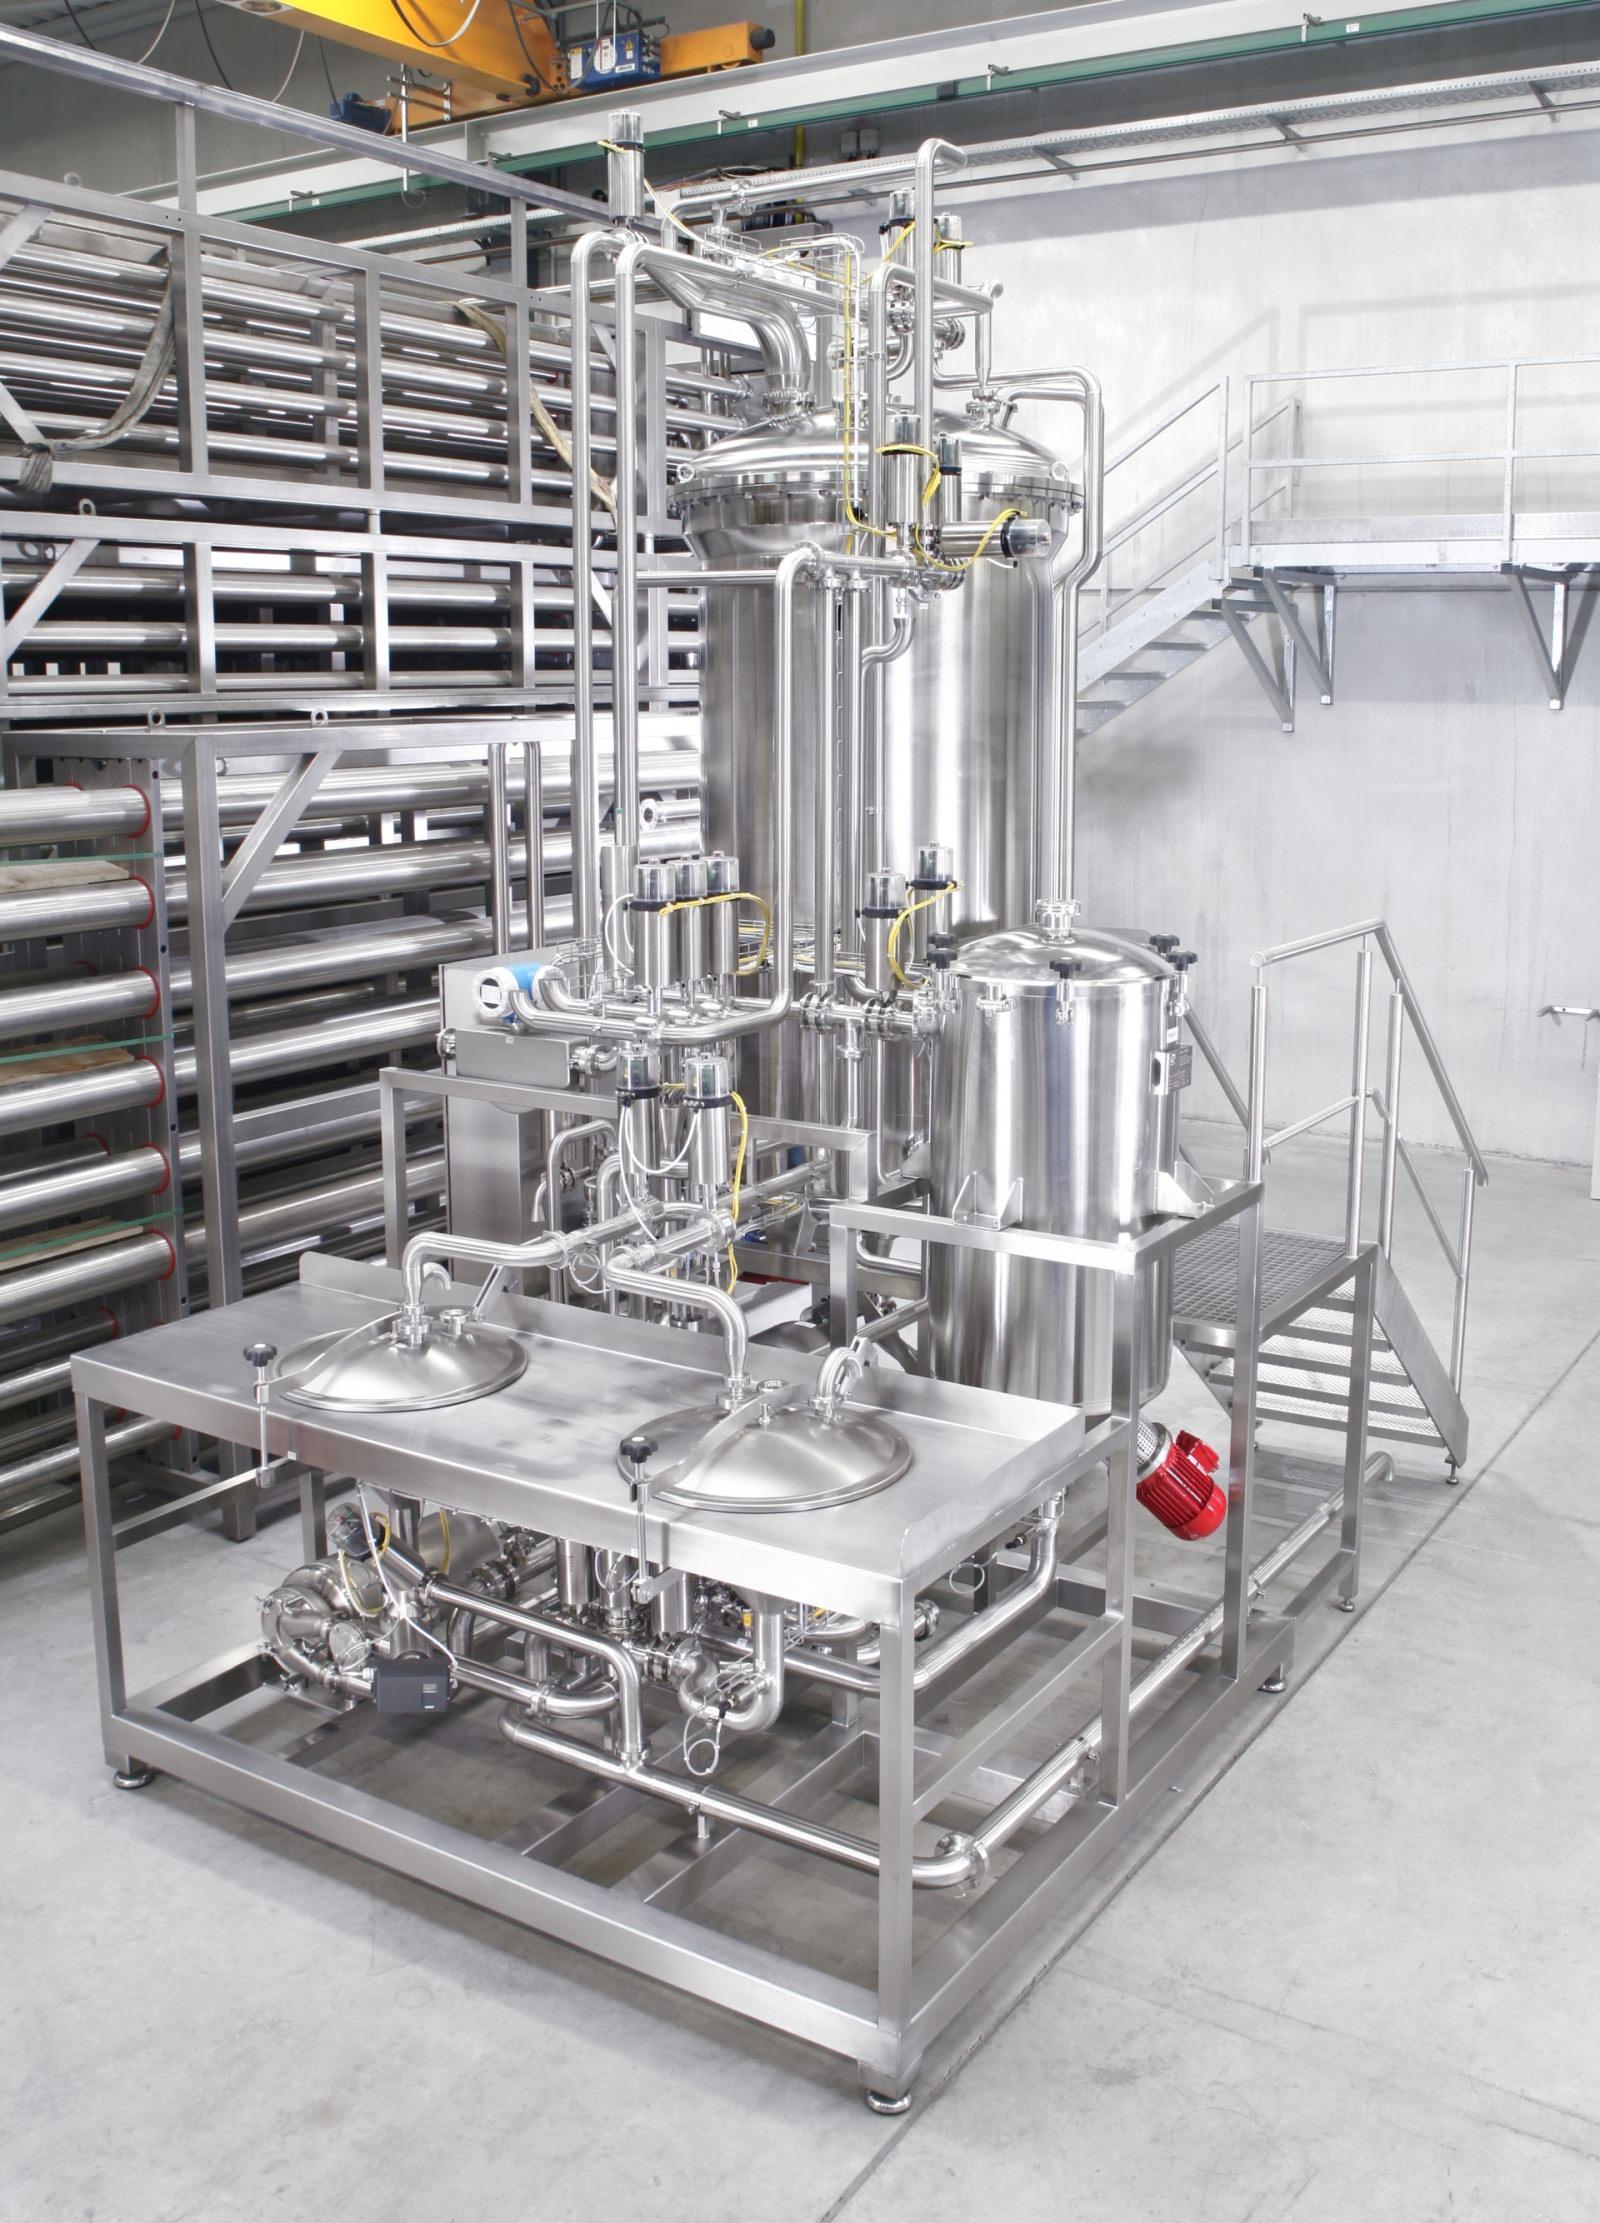 Photo powder dissolving station